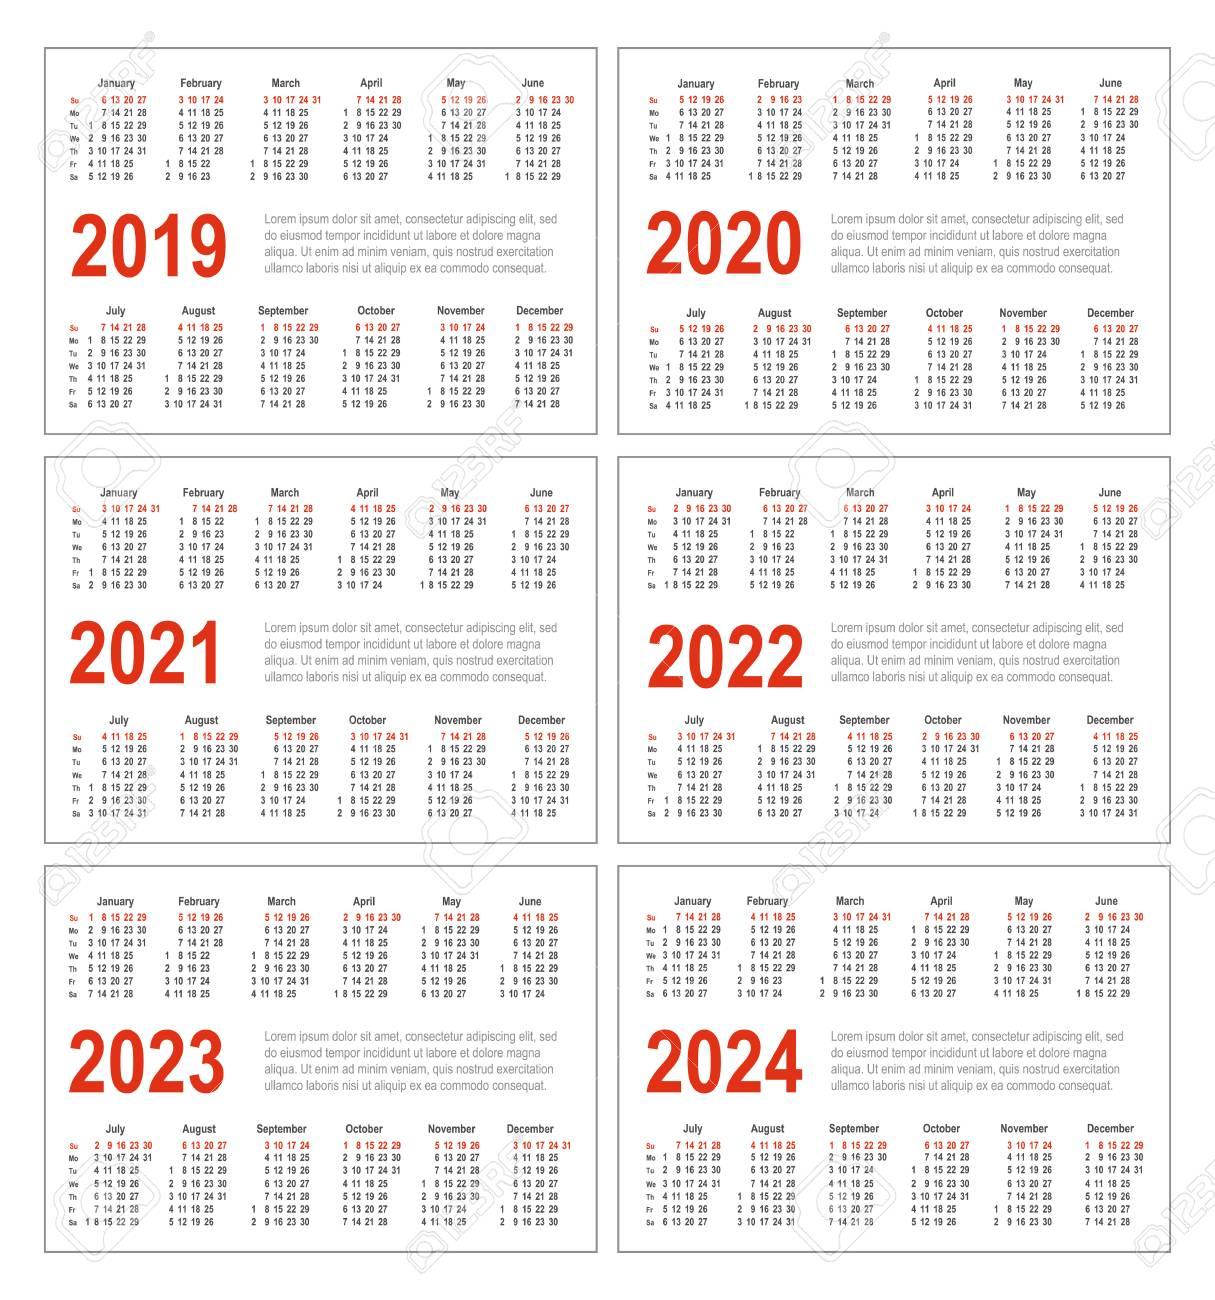 2 Year Pocket Calendar 2020 And 2021 | Printable Calendar Free in 2021-2021: 2 Year Calendar Pocket